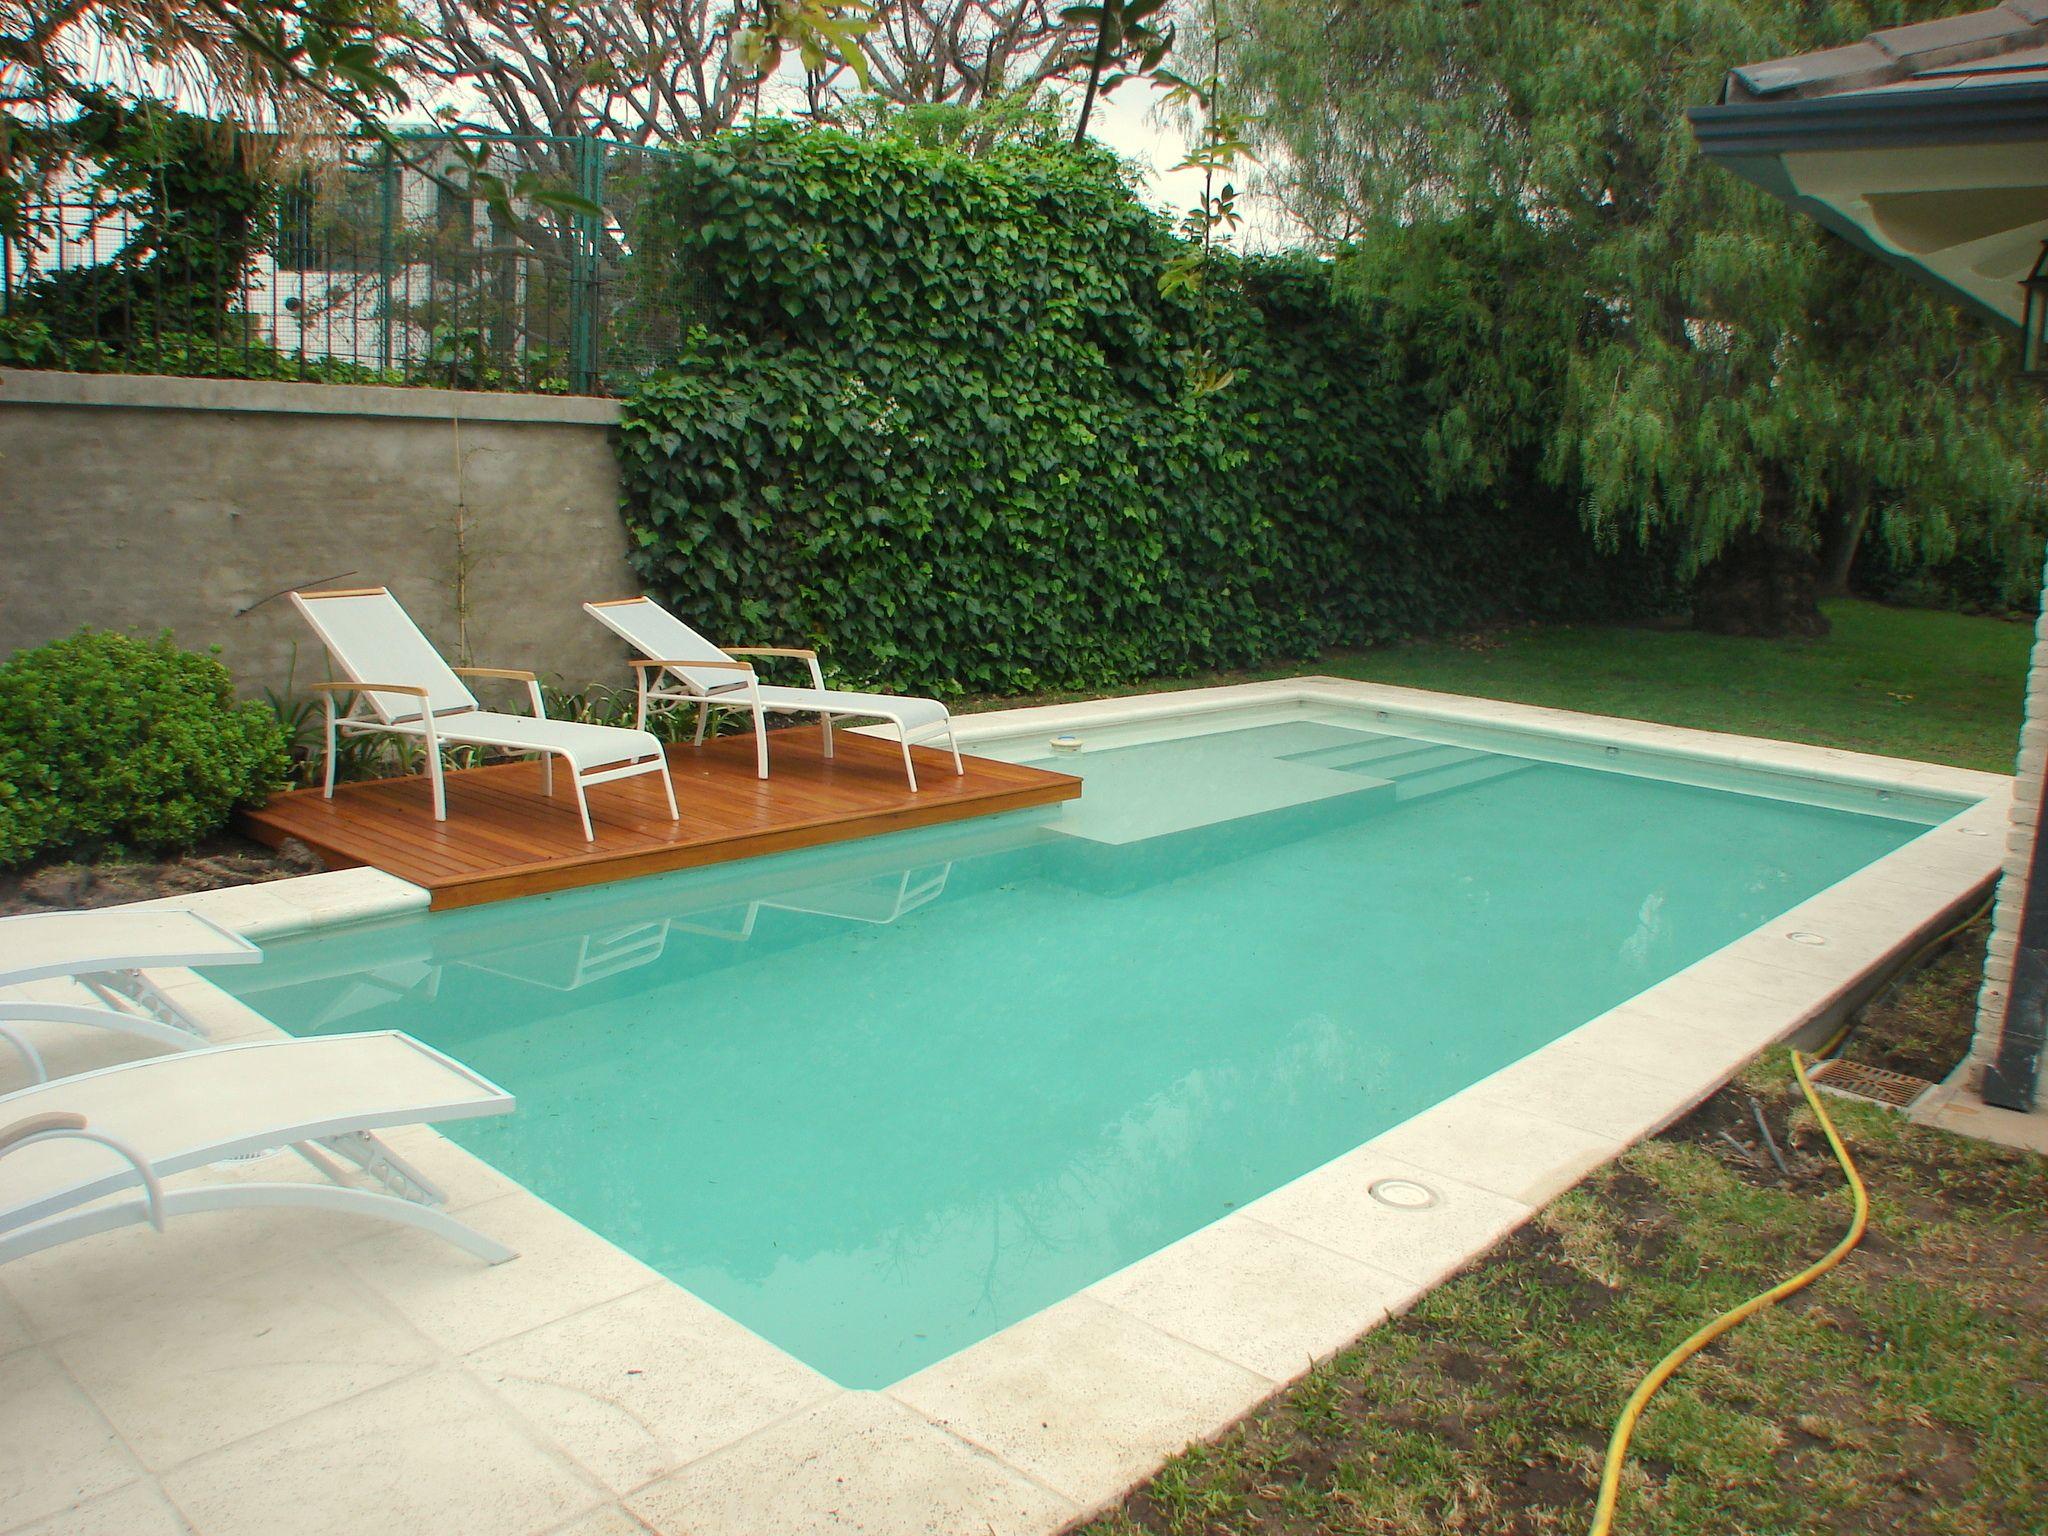 Faszinierend Poolhaus Bauen Galerie Von Above Ground Pool Ideas To Beautify A